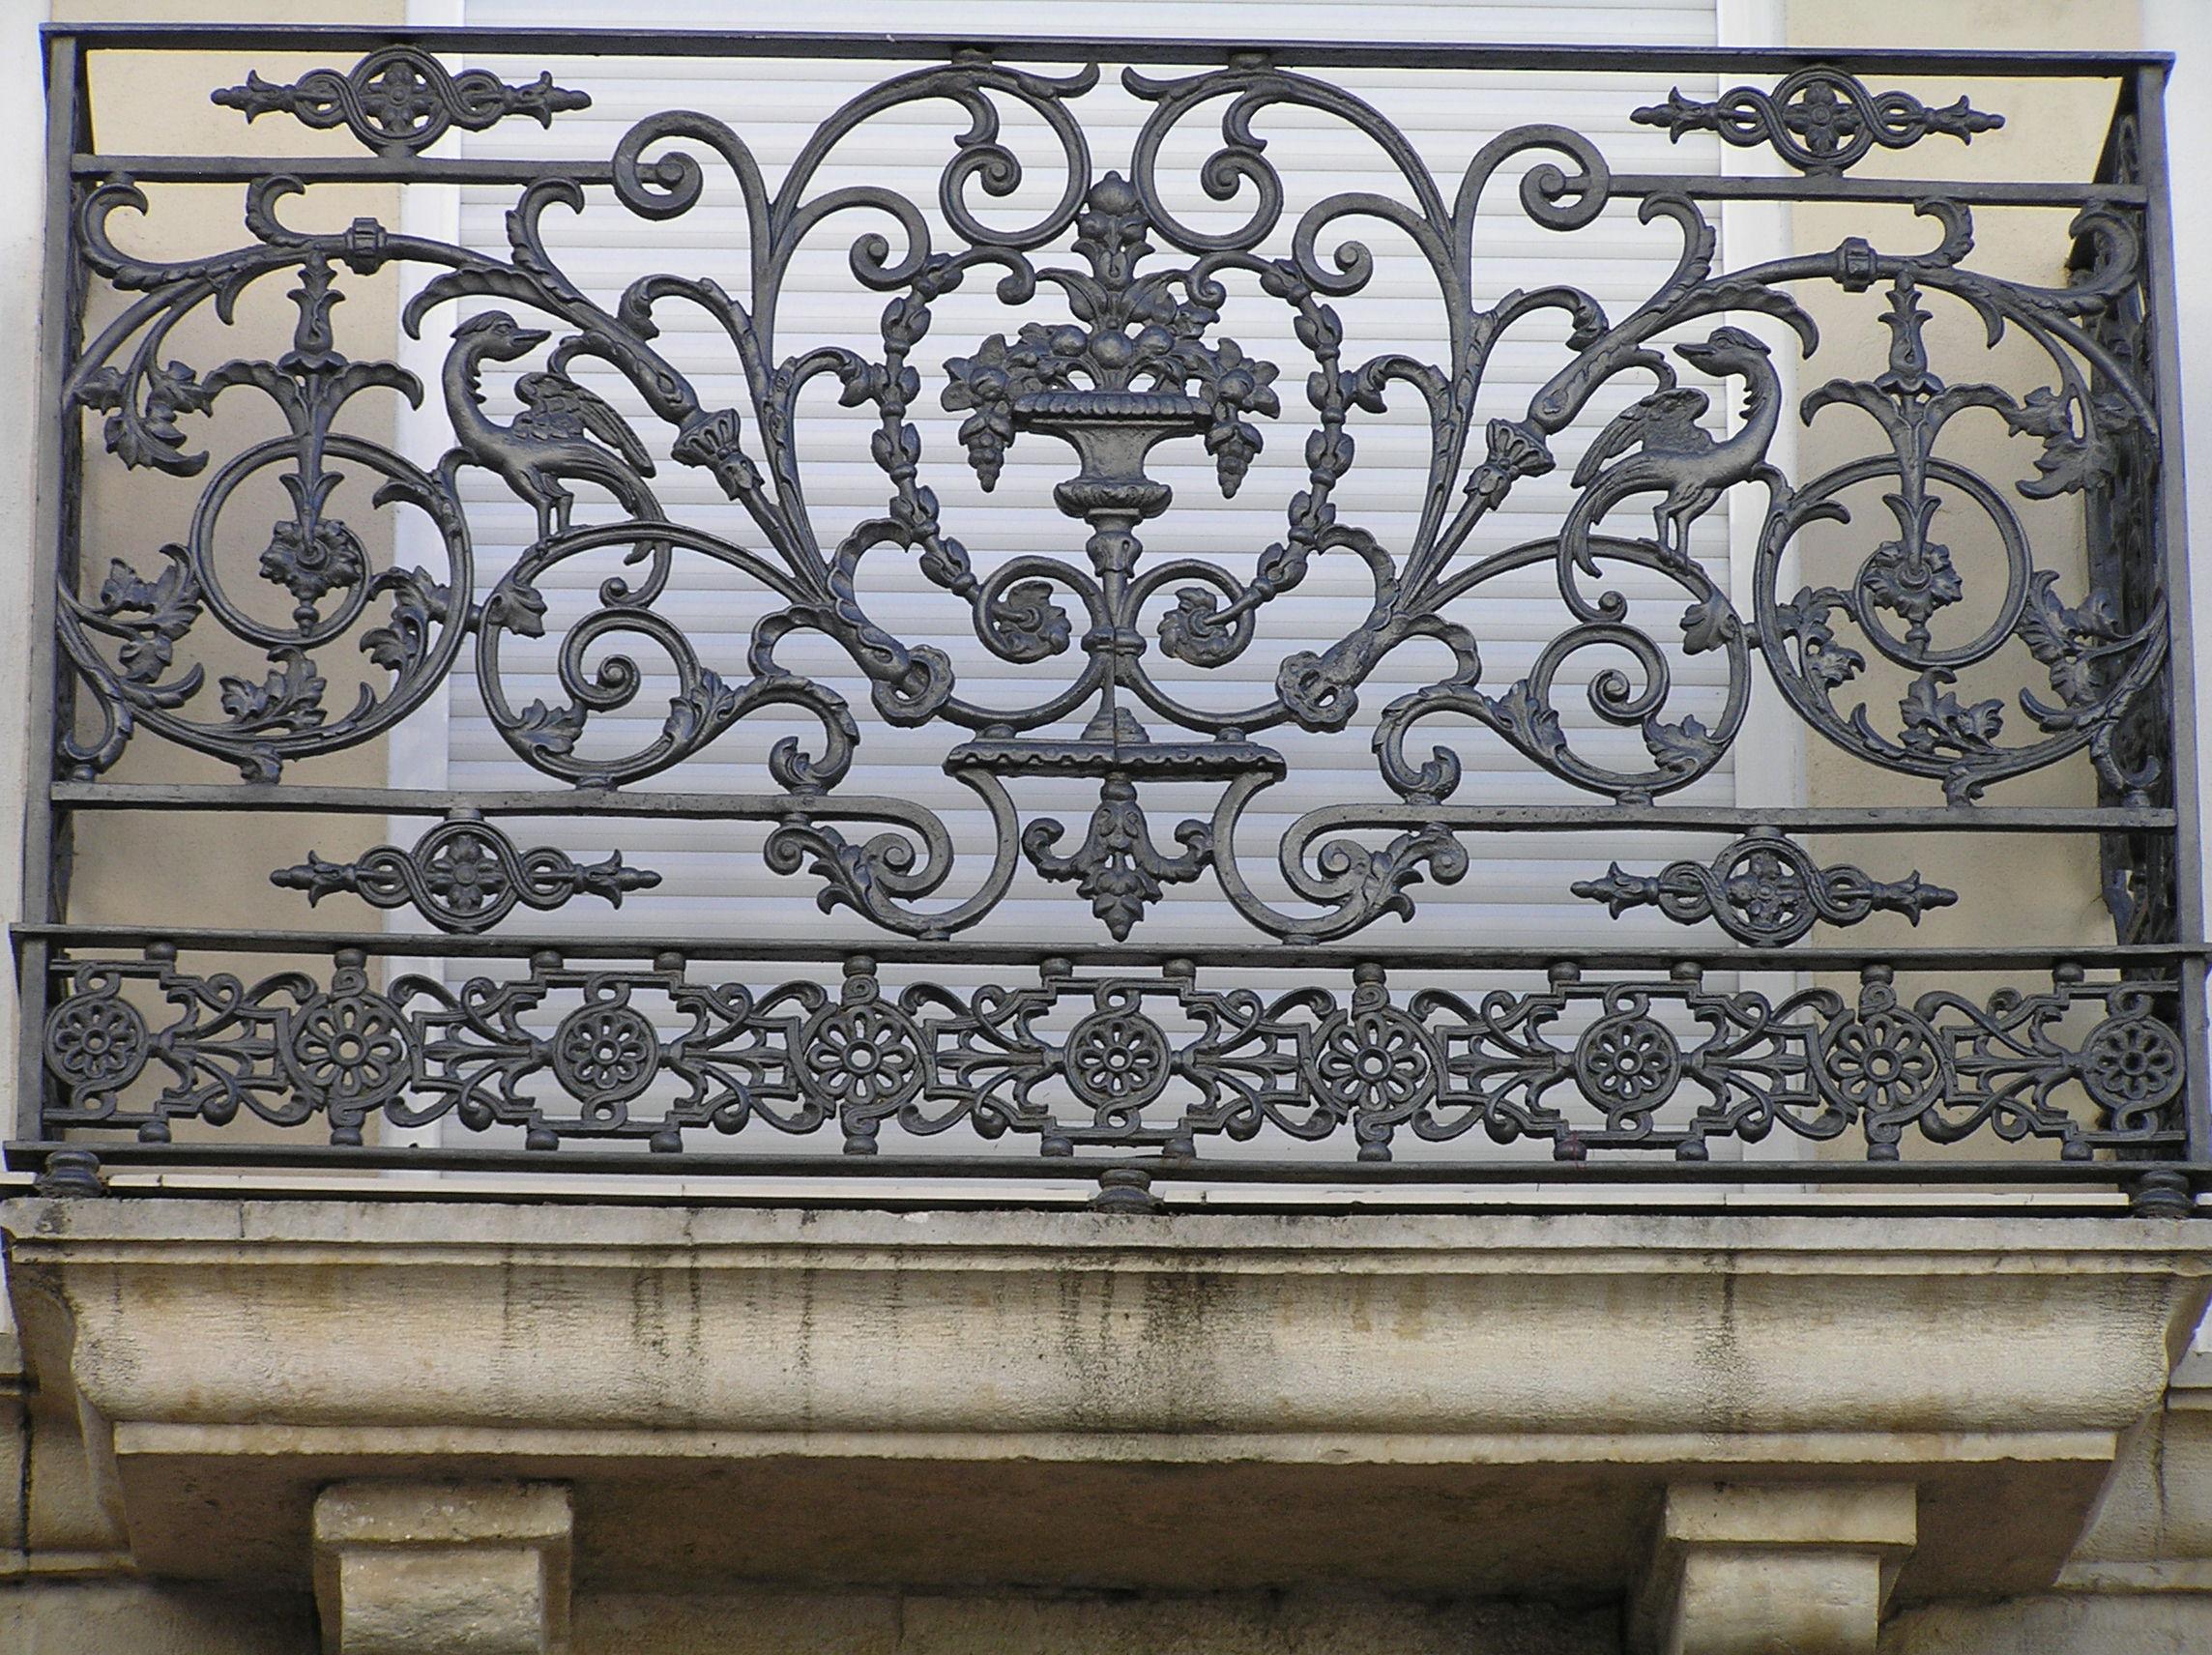 Puertas de hierro forjado herreria tattoo design bild - Fotos de puertas de hierro ...